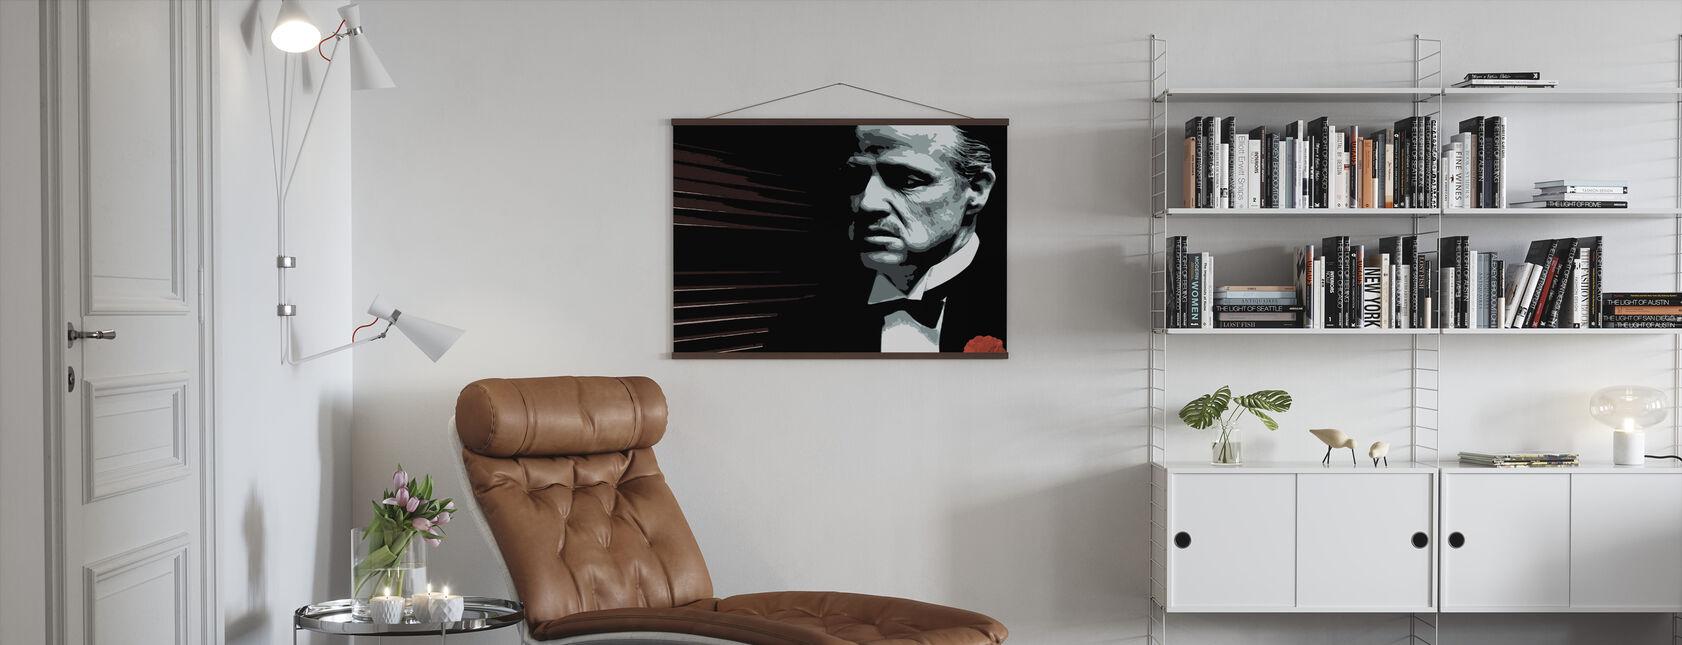 Don Vito - Poster - Living Room